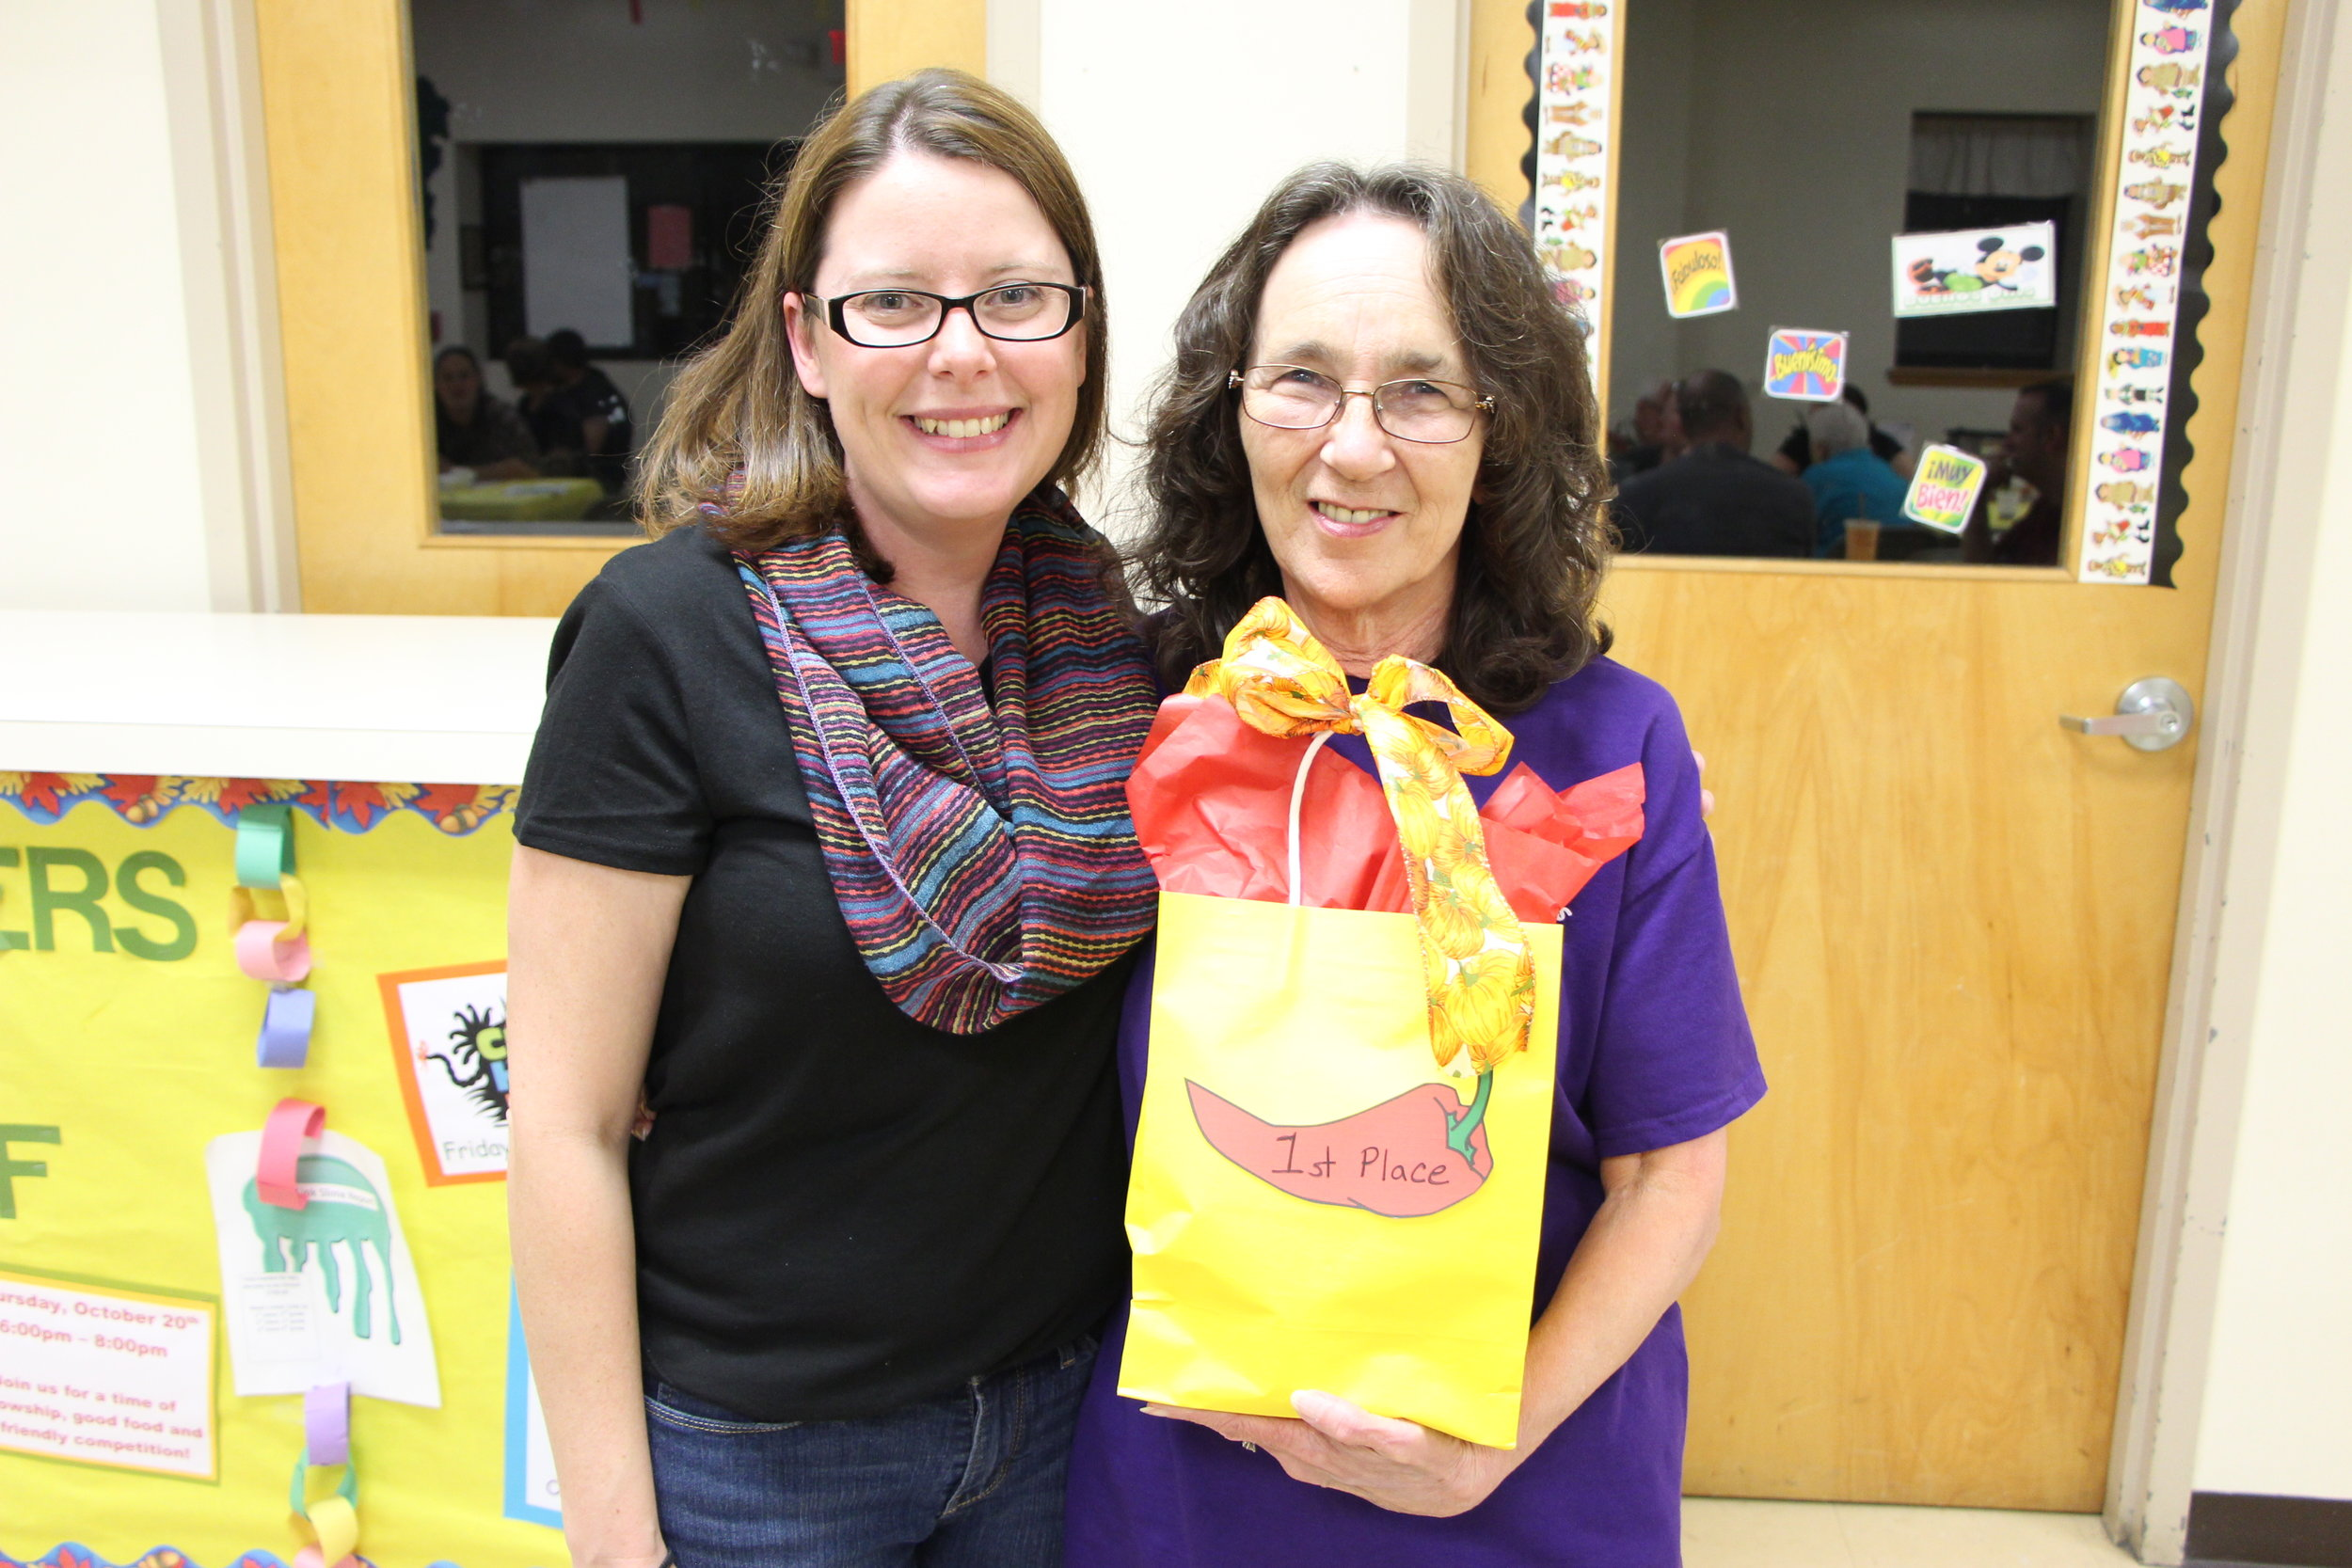 Congratulations to Mrs. Bateman for winning First Place!